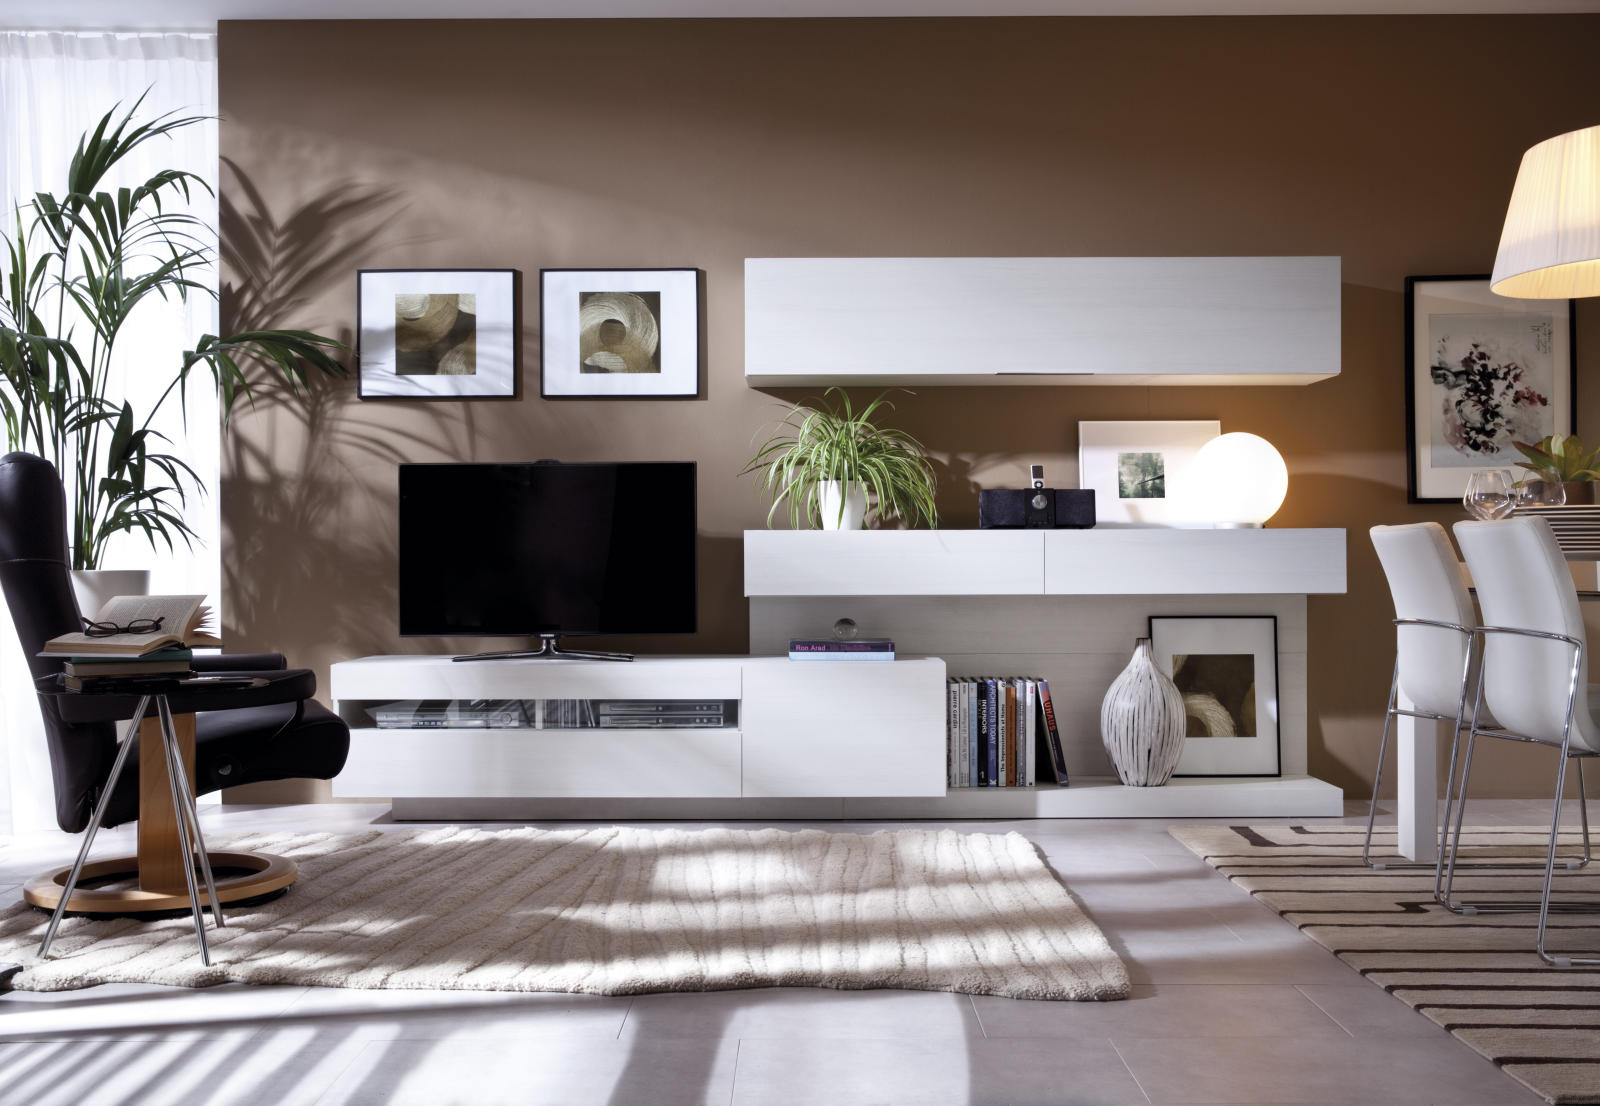 rebajas de enero 2015 muebles epa muebles epa blog